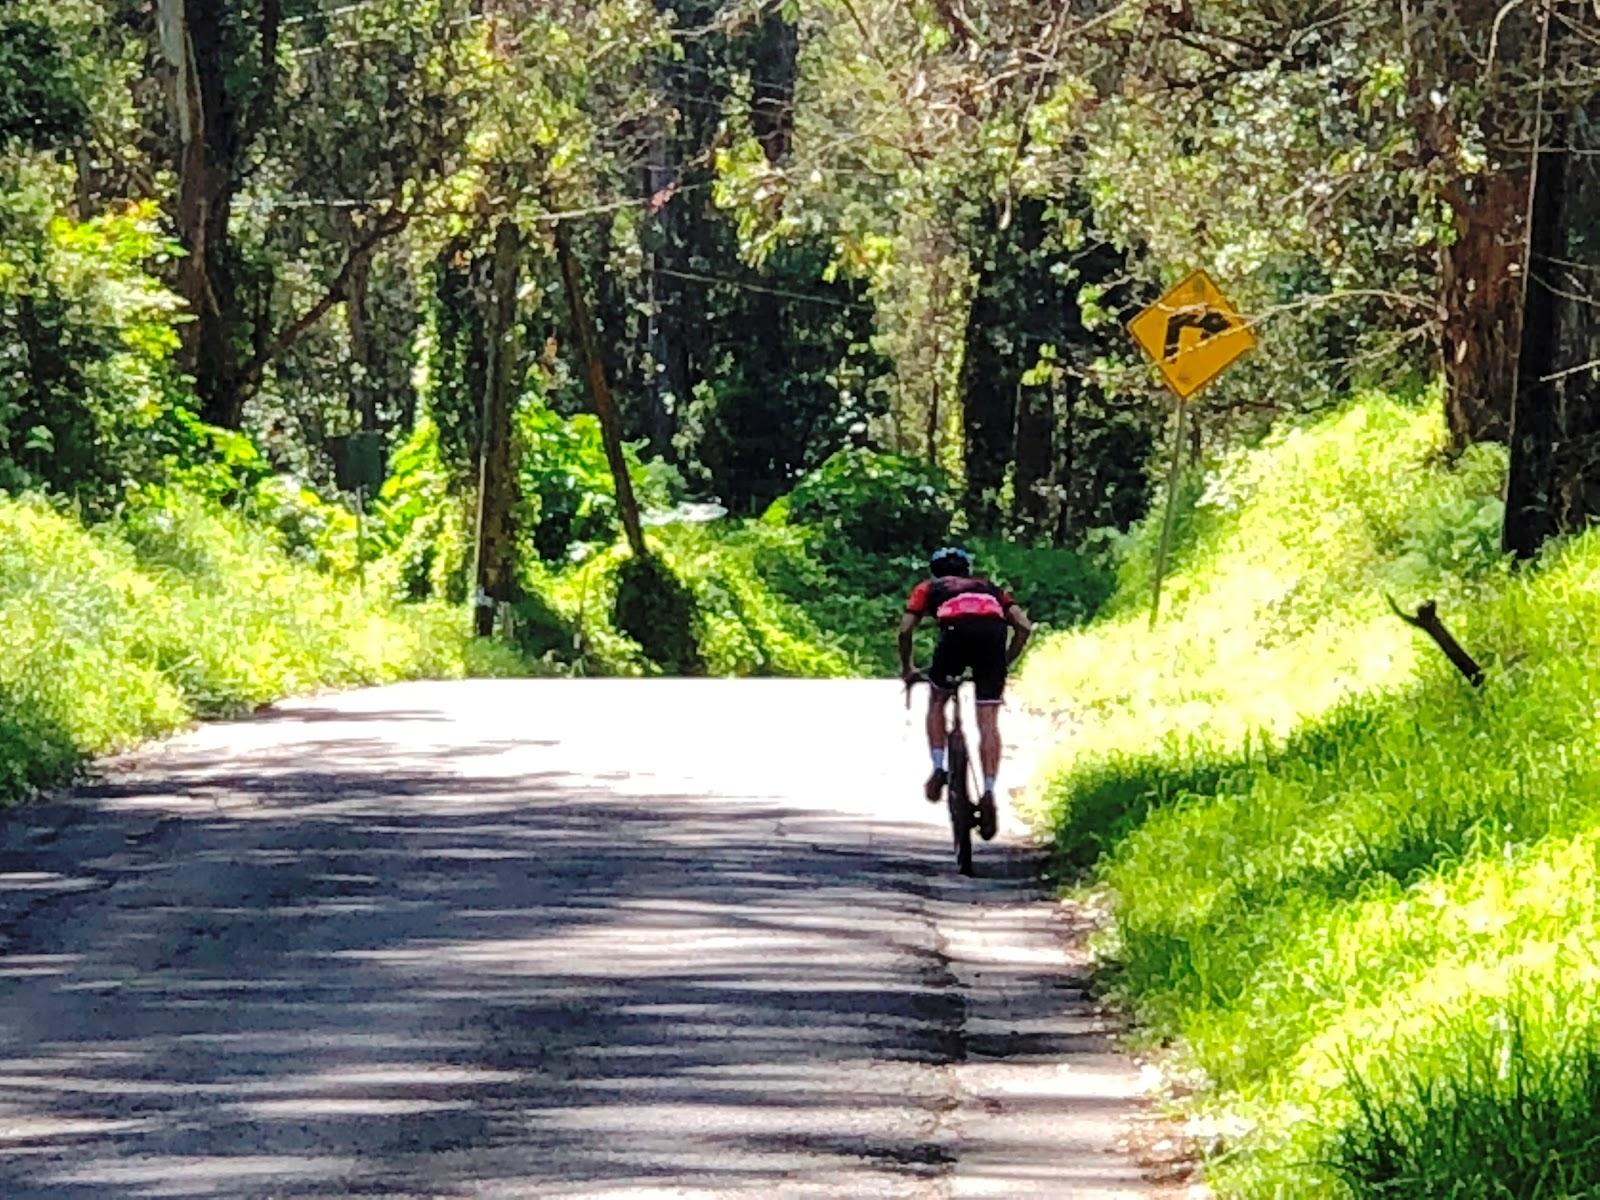 Cyclists climbing steep section of Waipoli Road by bike.